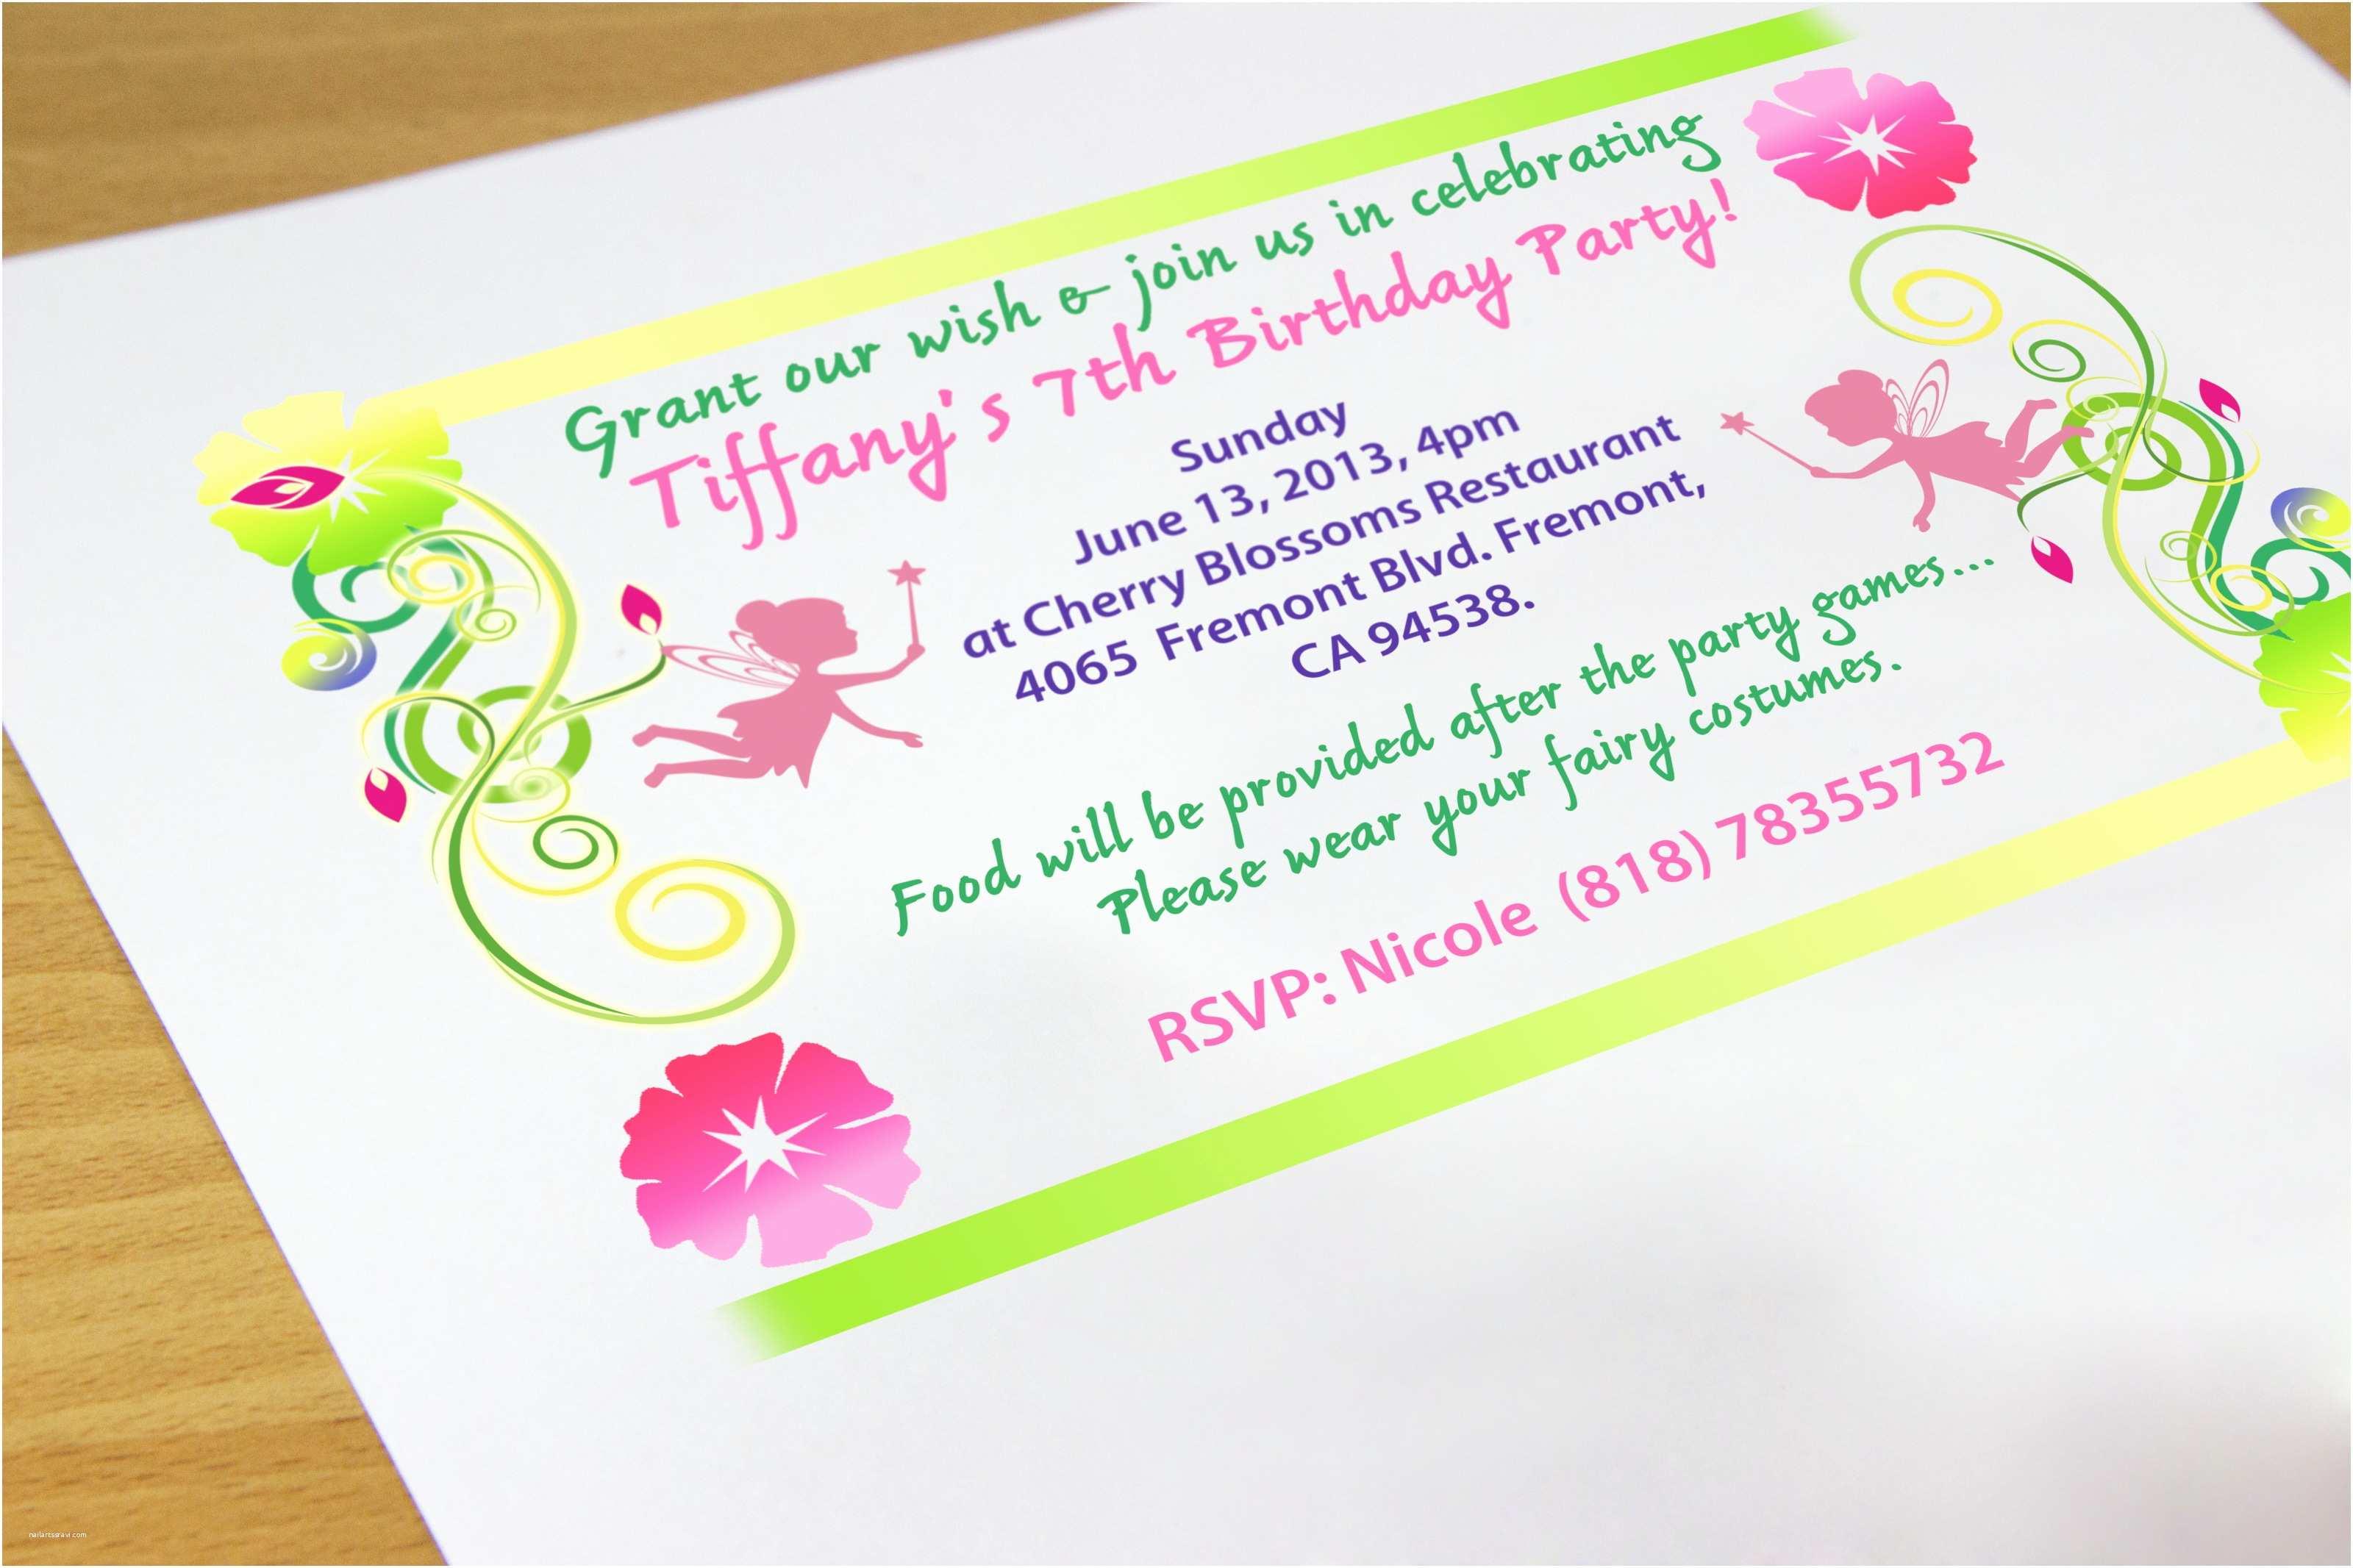 Design Birthday Invitations How to Make Party Invitations